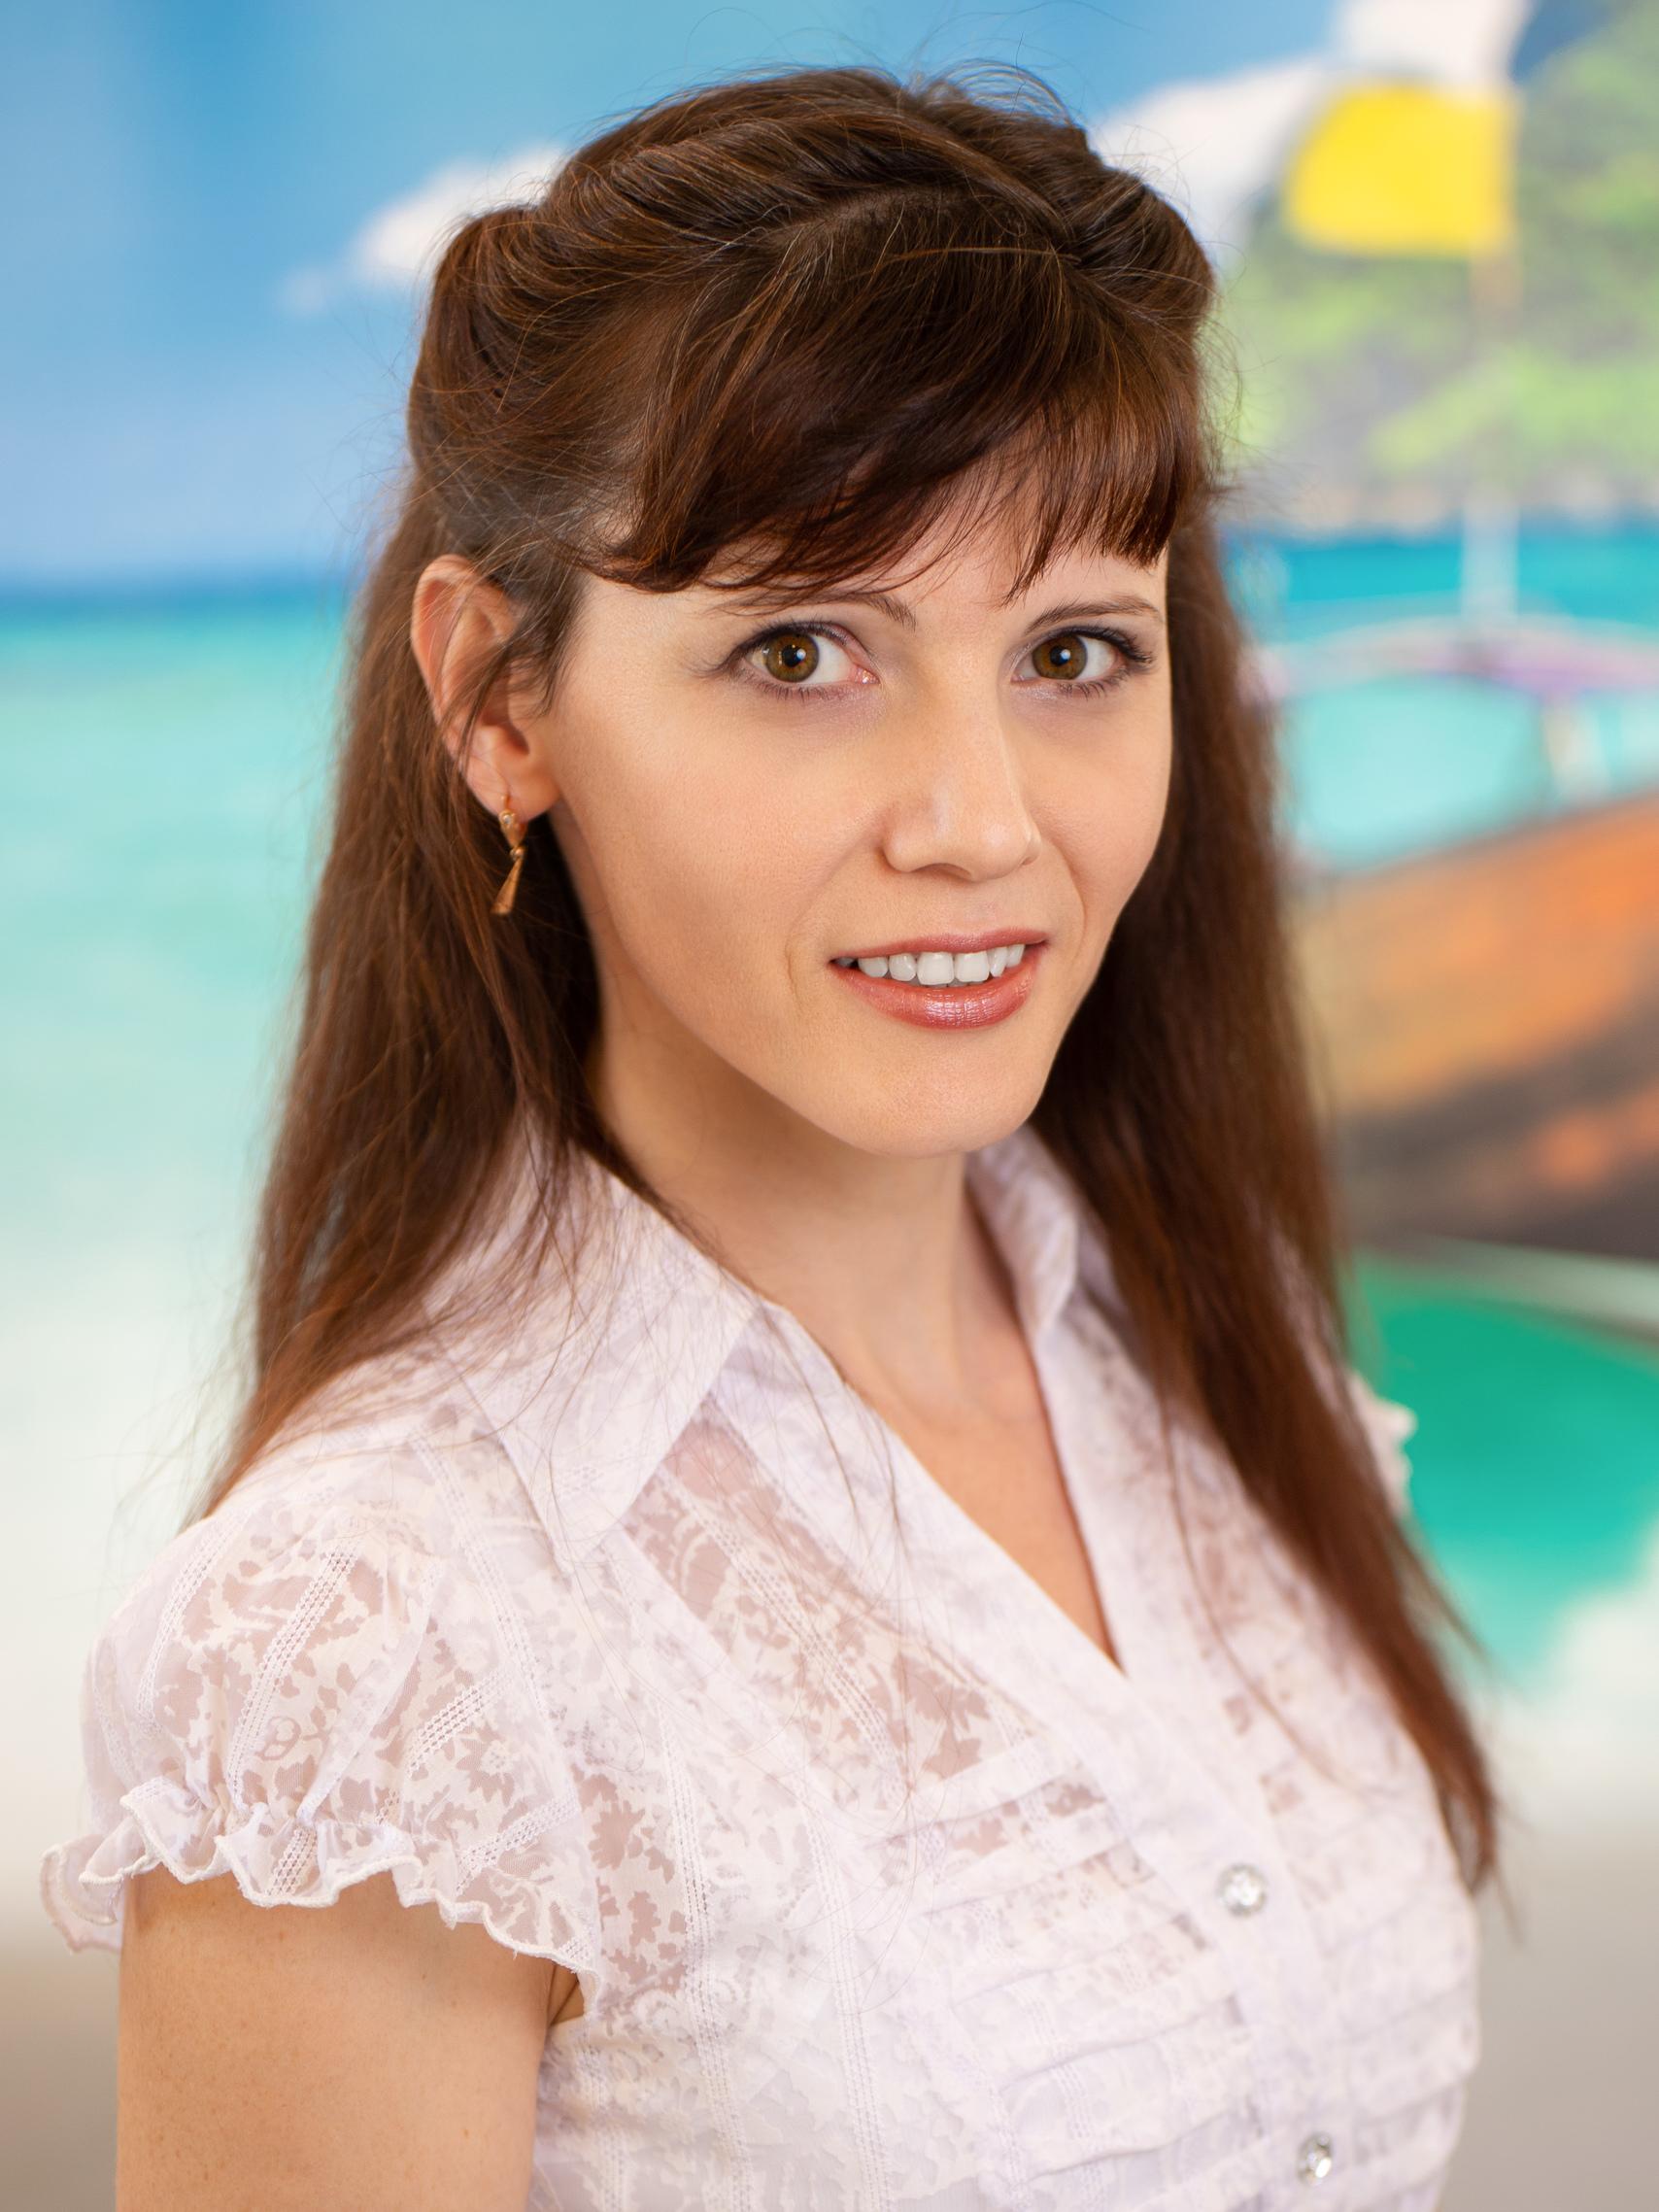 Linas Reiseagentur Darja Weber Reisebüro Papenburg